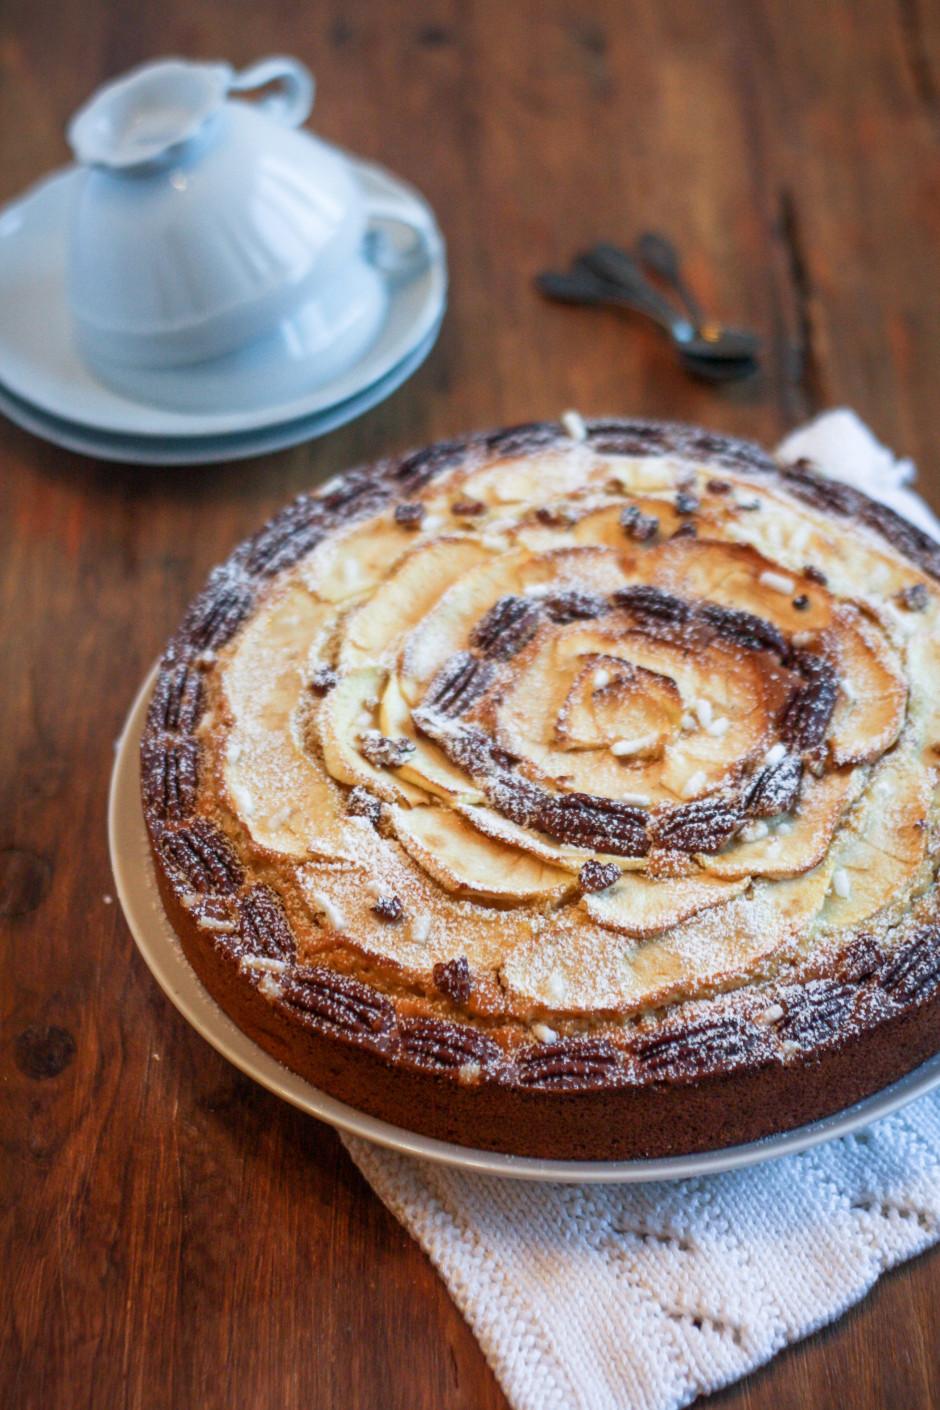 torta mele e noci pecan 940x1410 Torta di mele e noci pecan